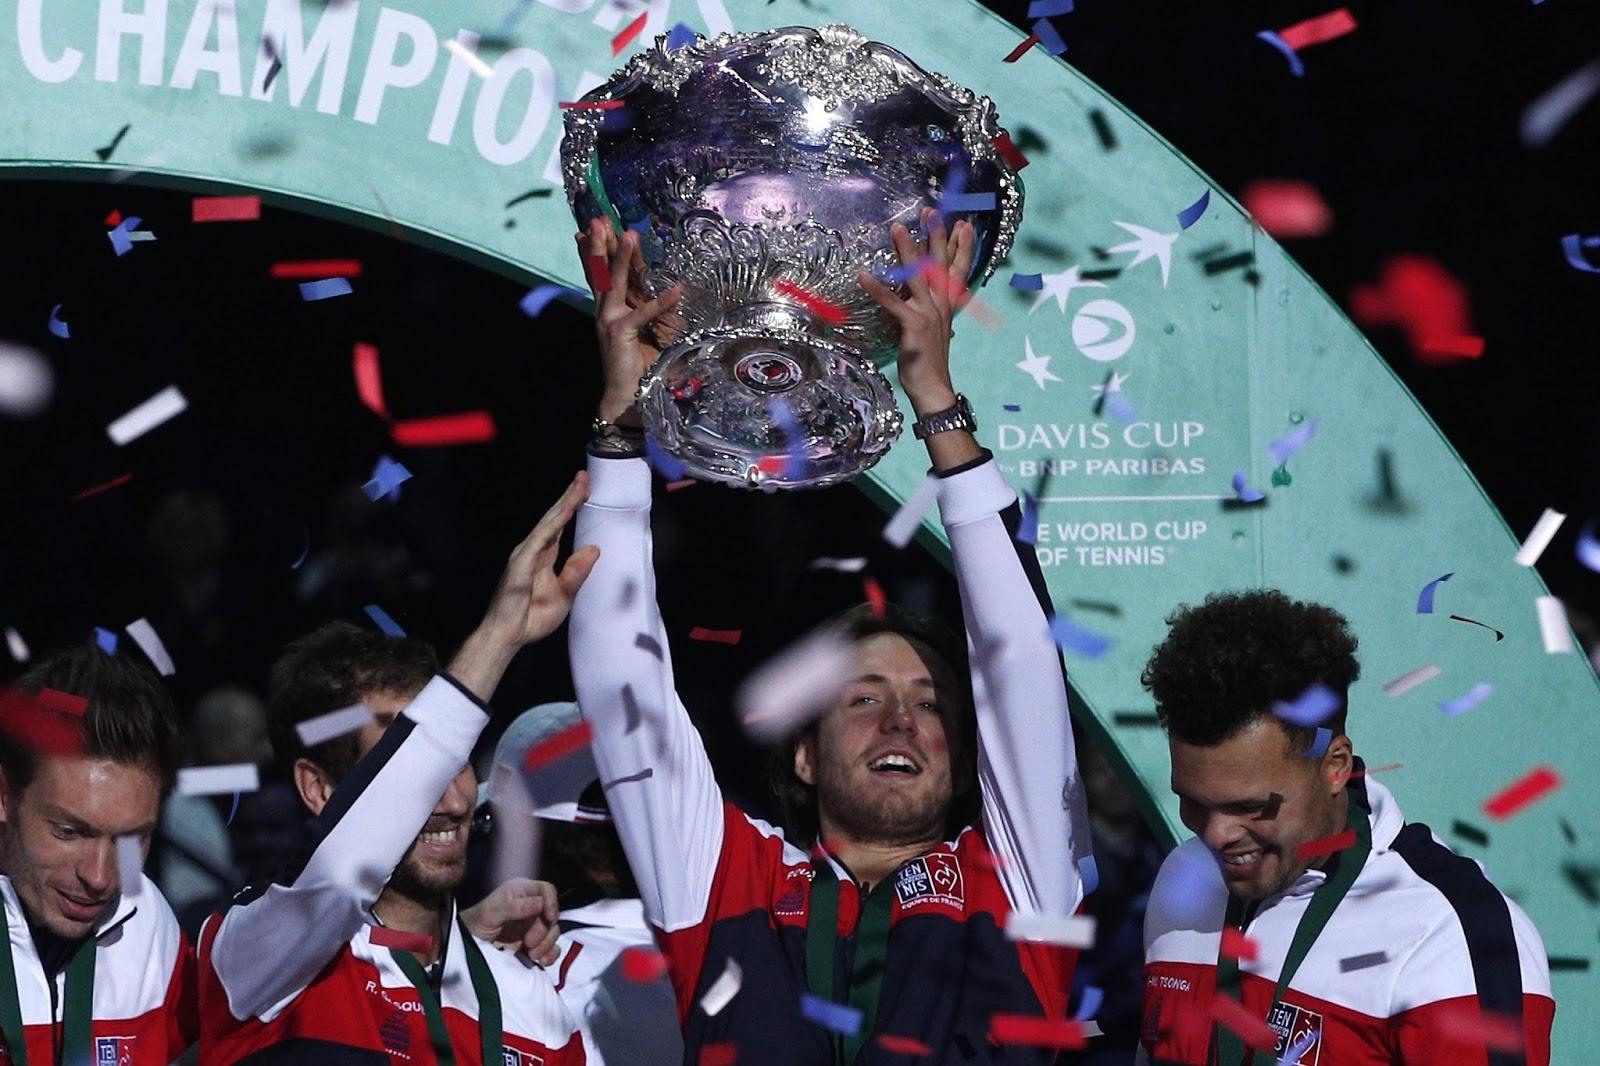 DAVIS CUP 4